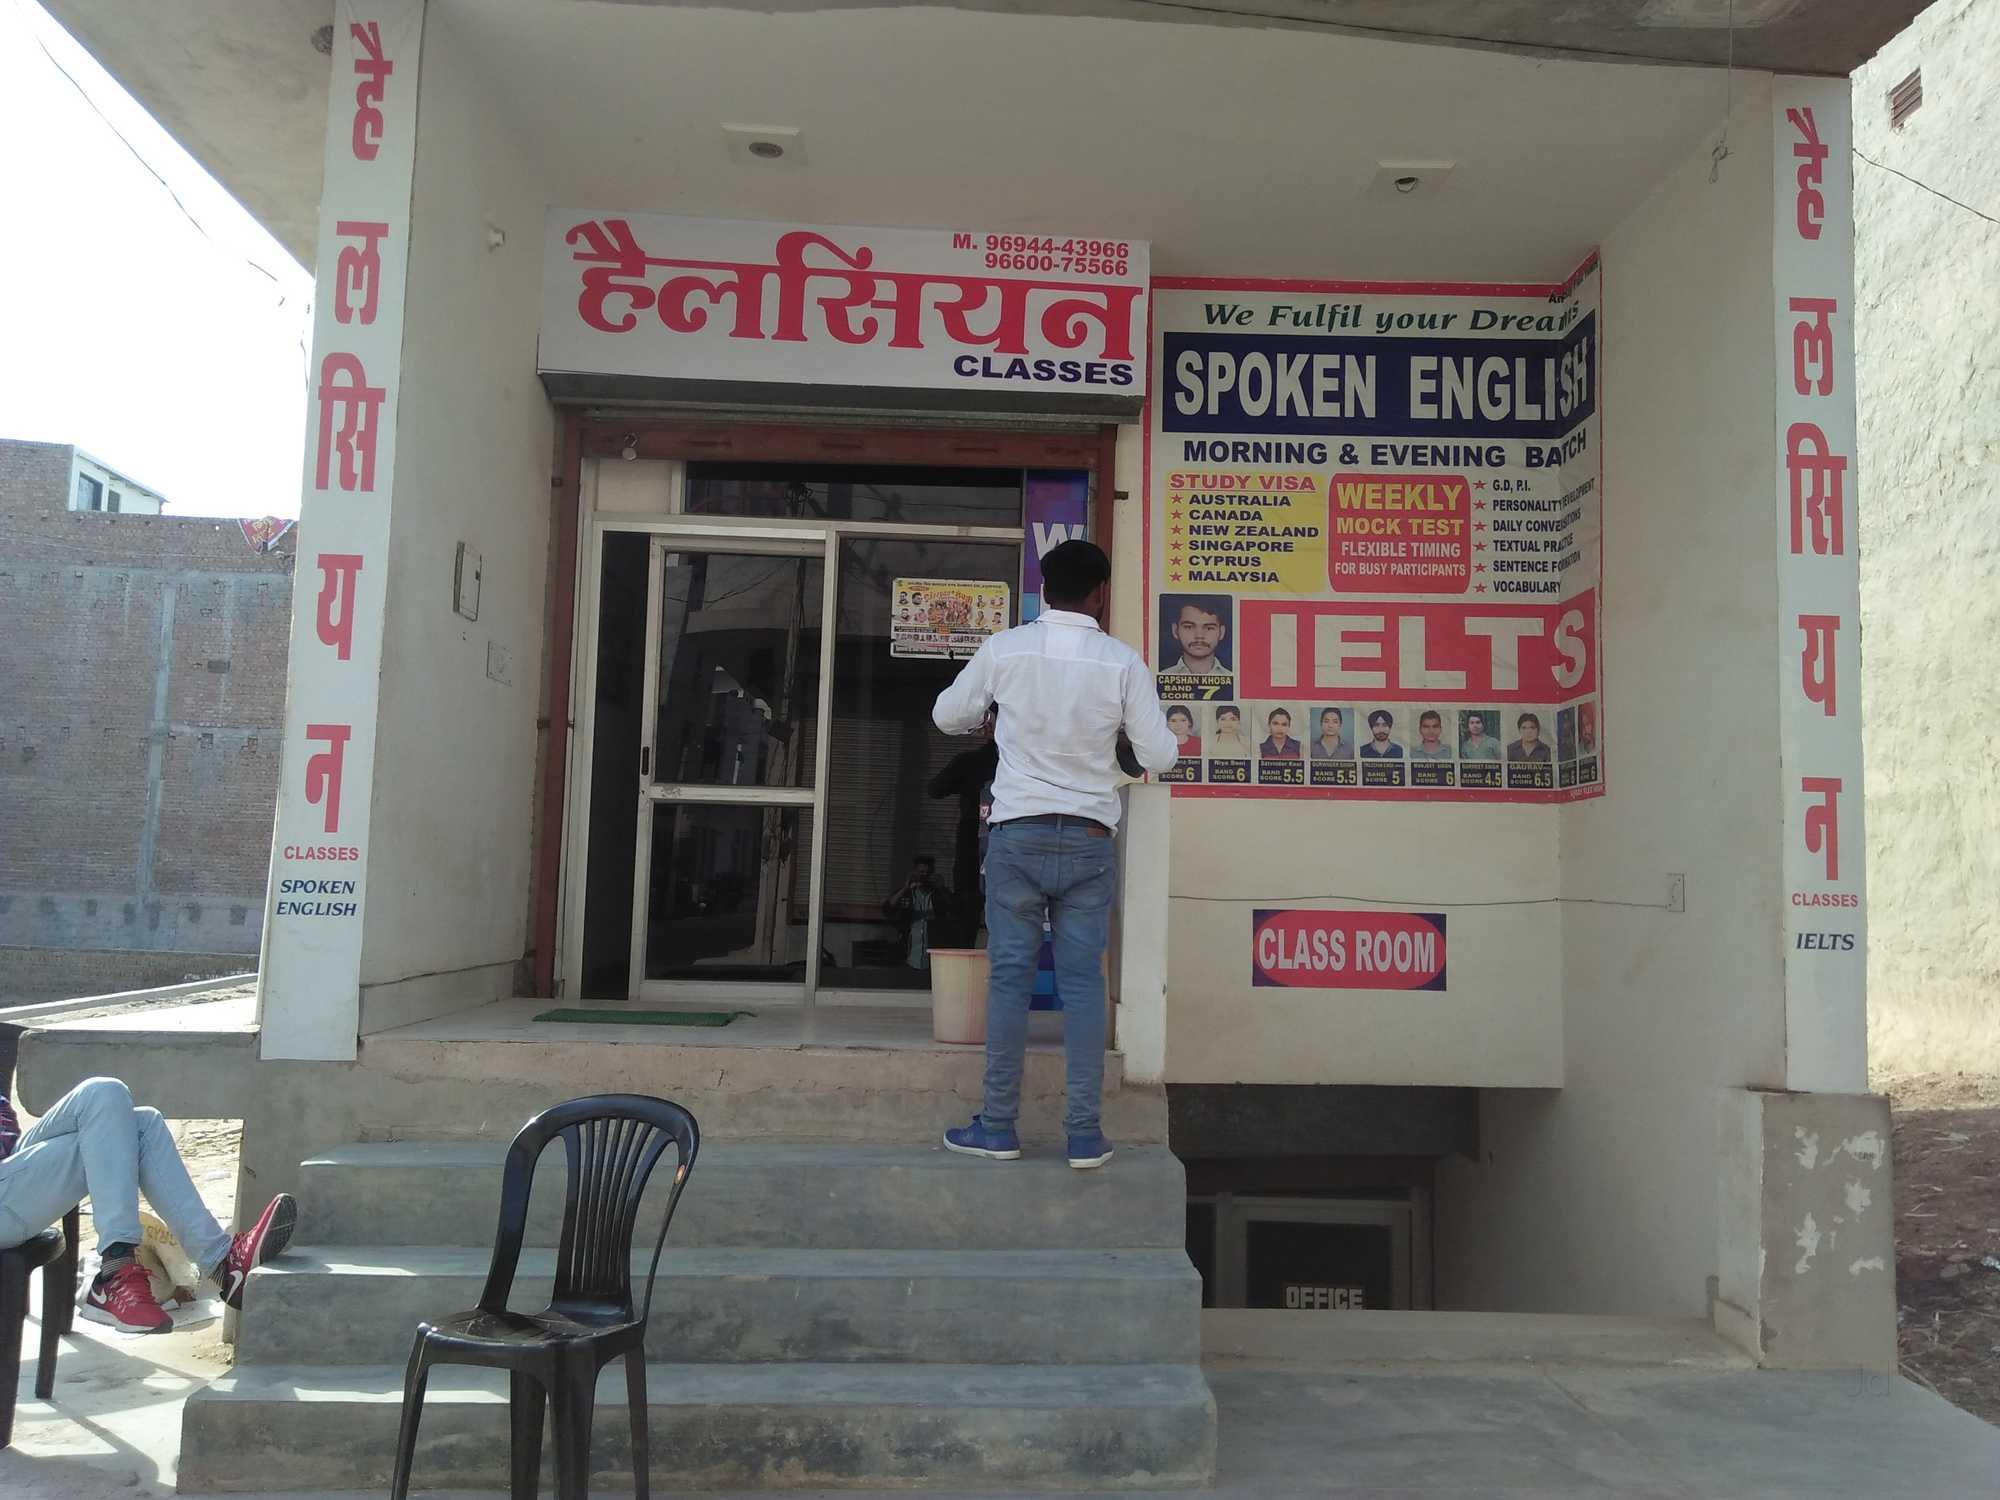 Top English Speaking Classes in Munda - Best Spoken English